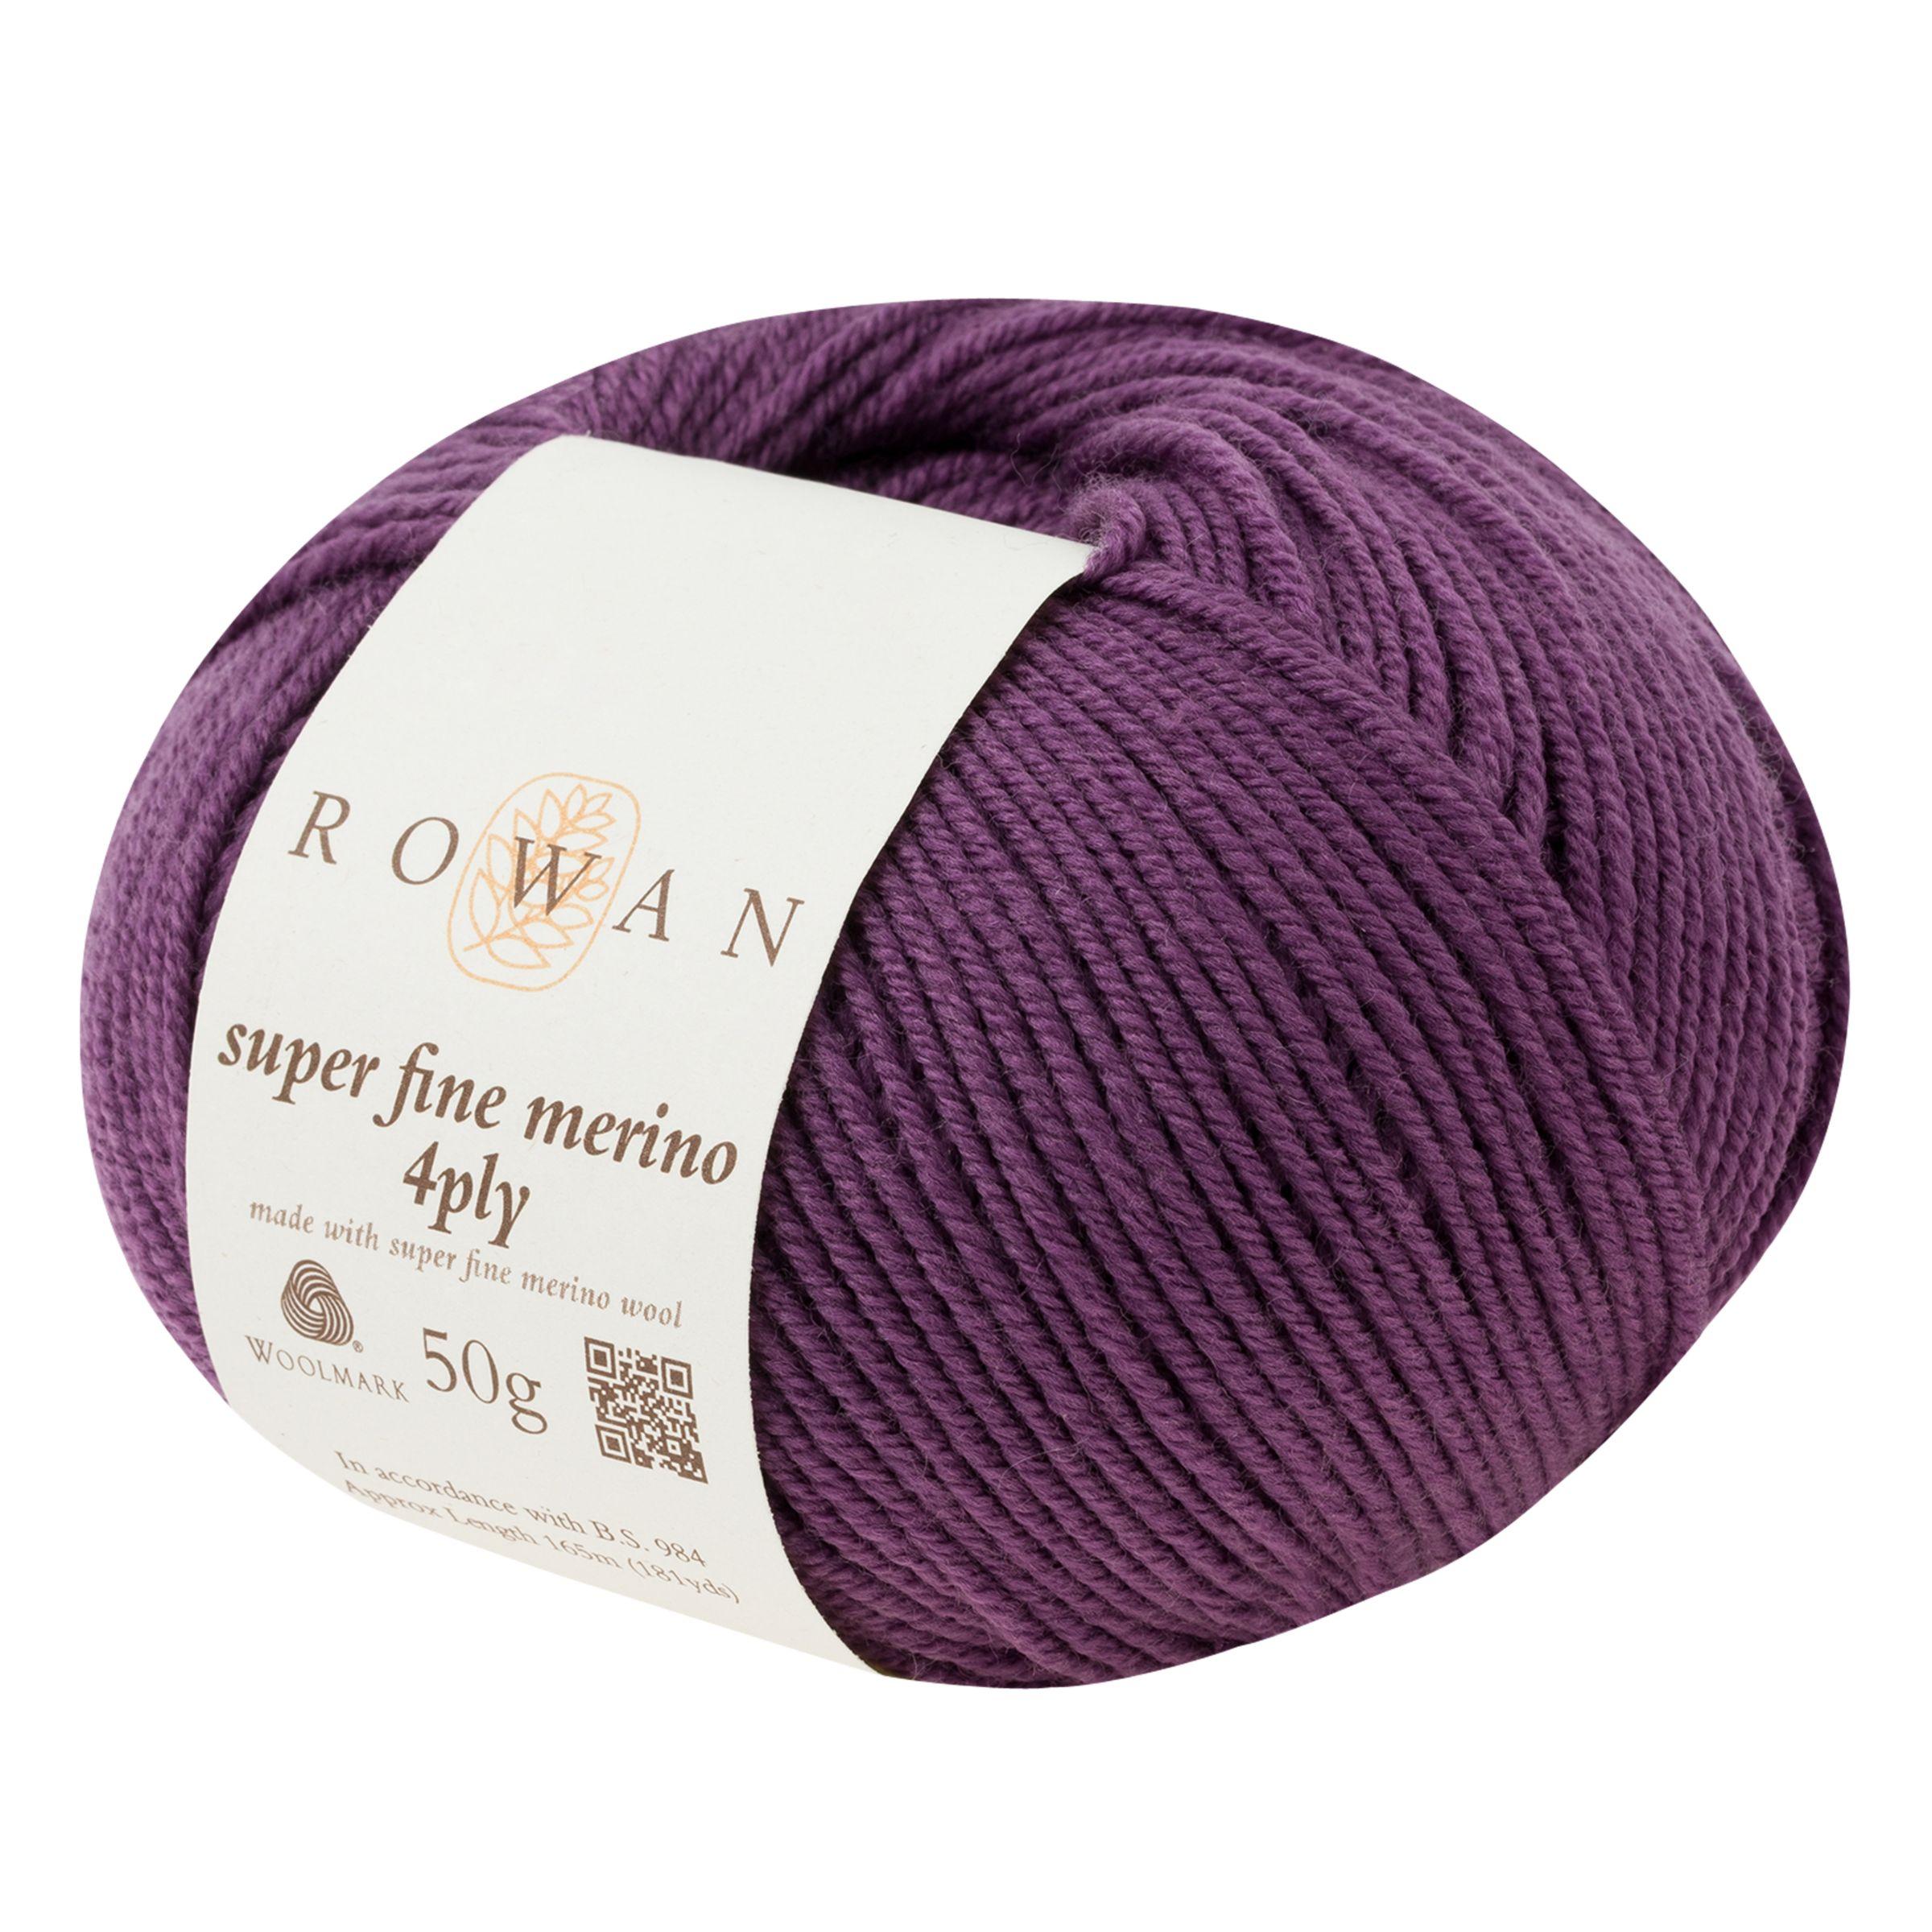 Rowan Rowan Super Fine Merino 4 Ply Yarn, 50g